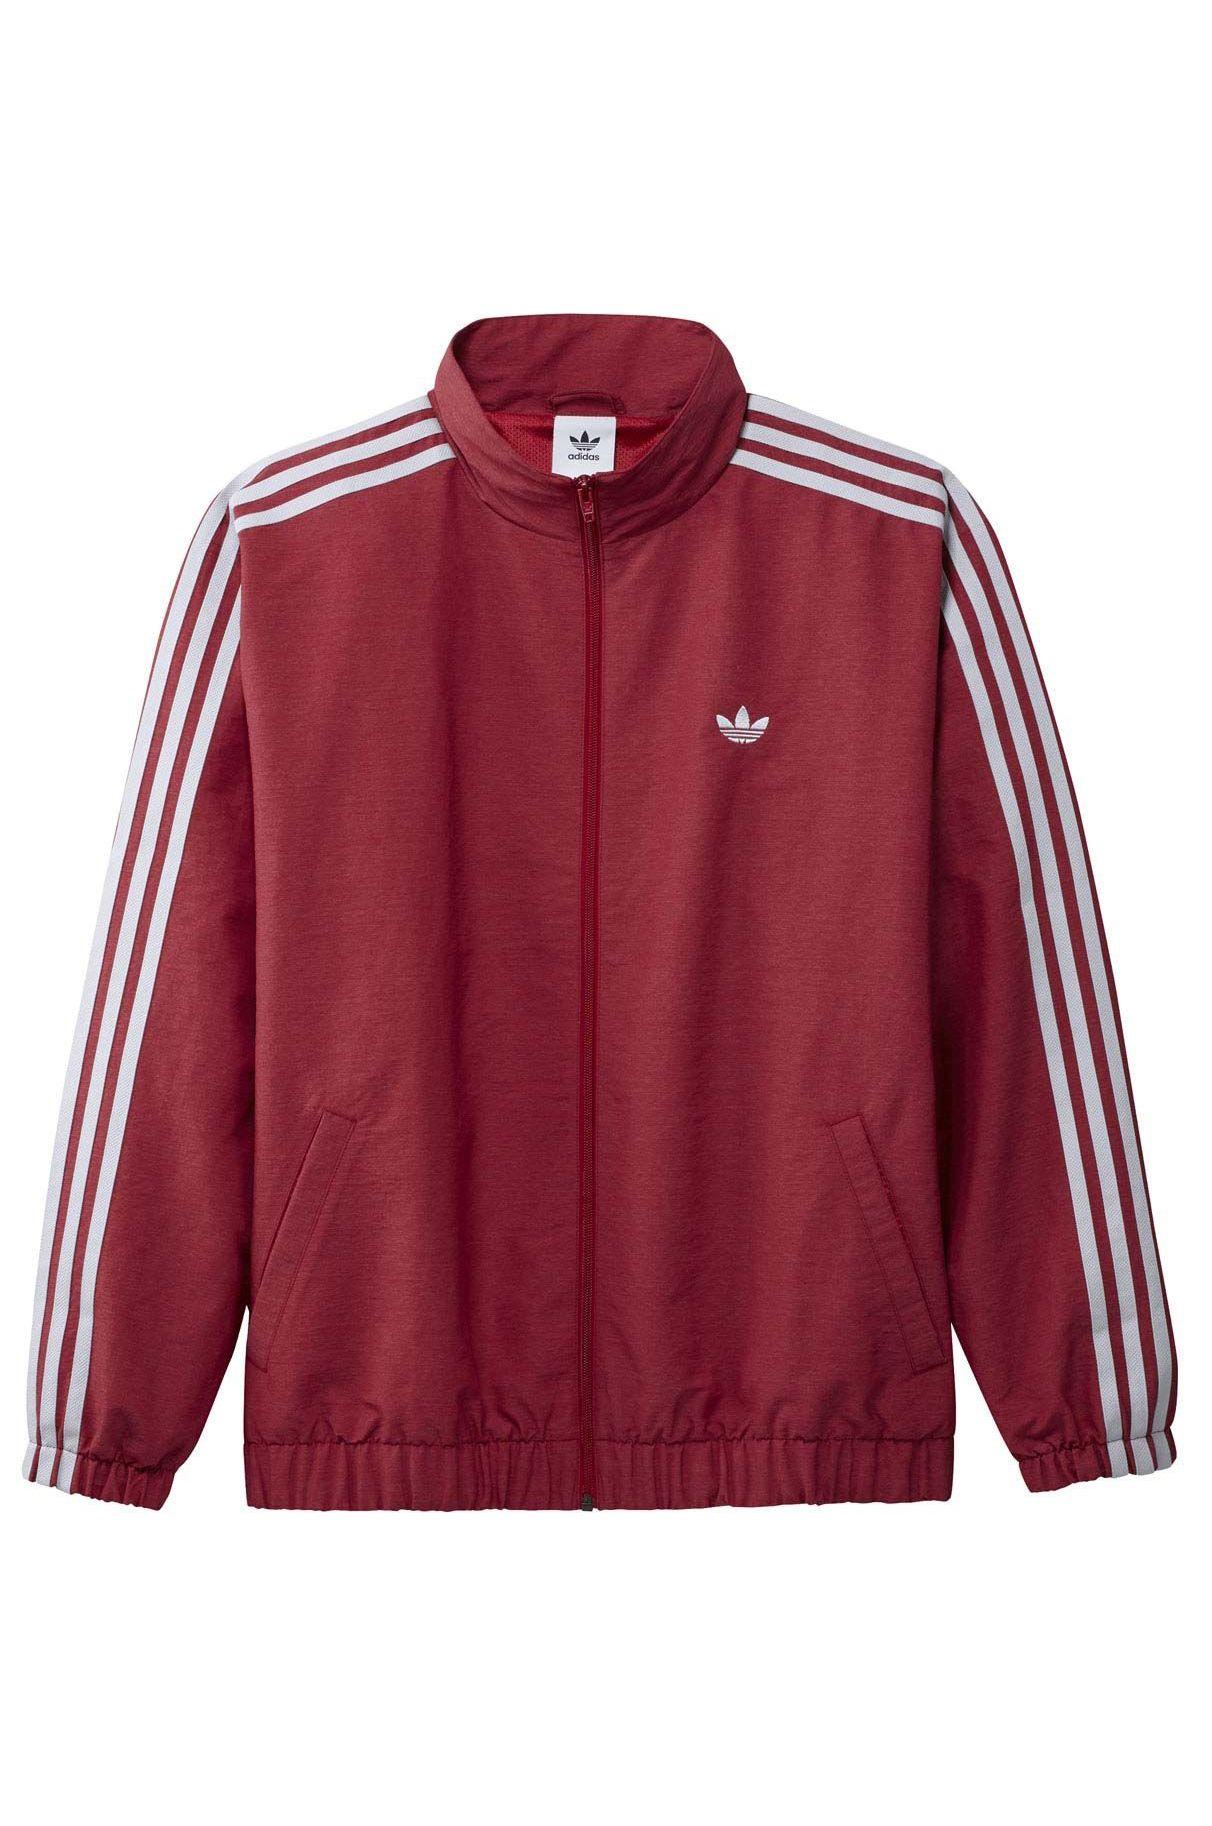 Adidas Coat FIREBIRD TRACK JACKET Team Victory Red/Dash Grey